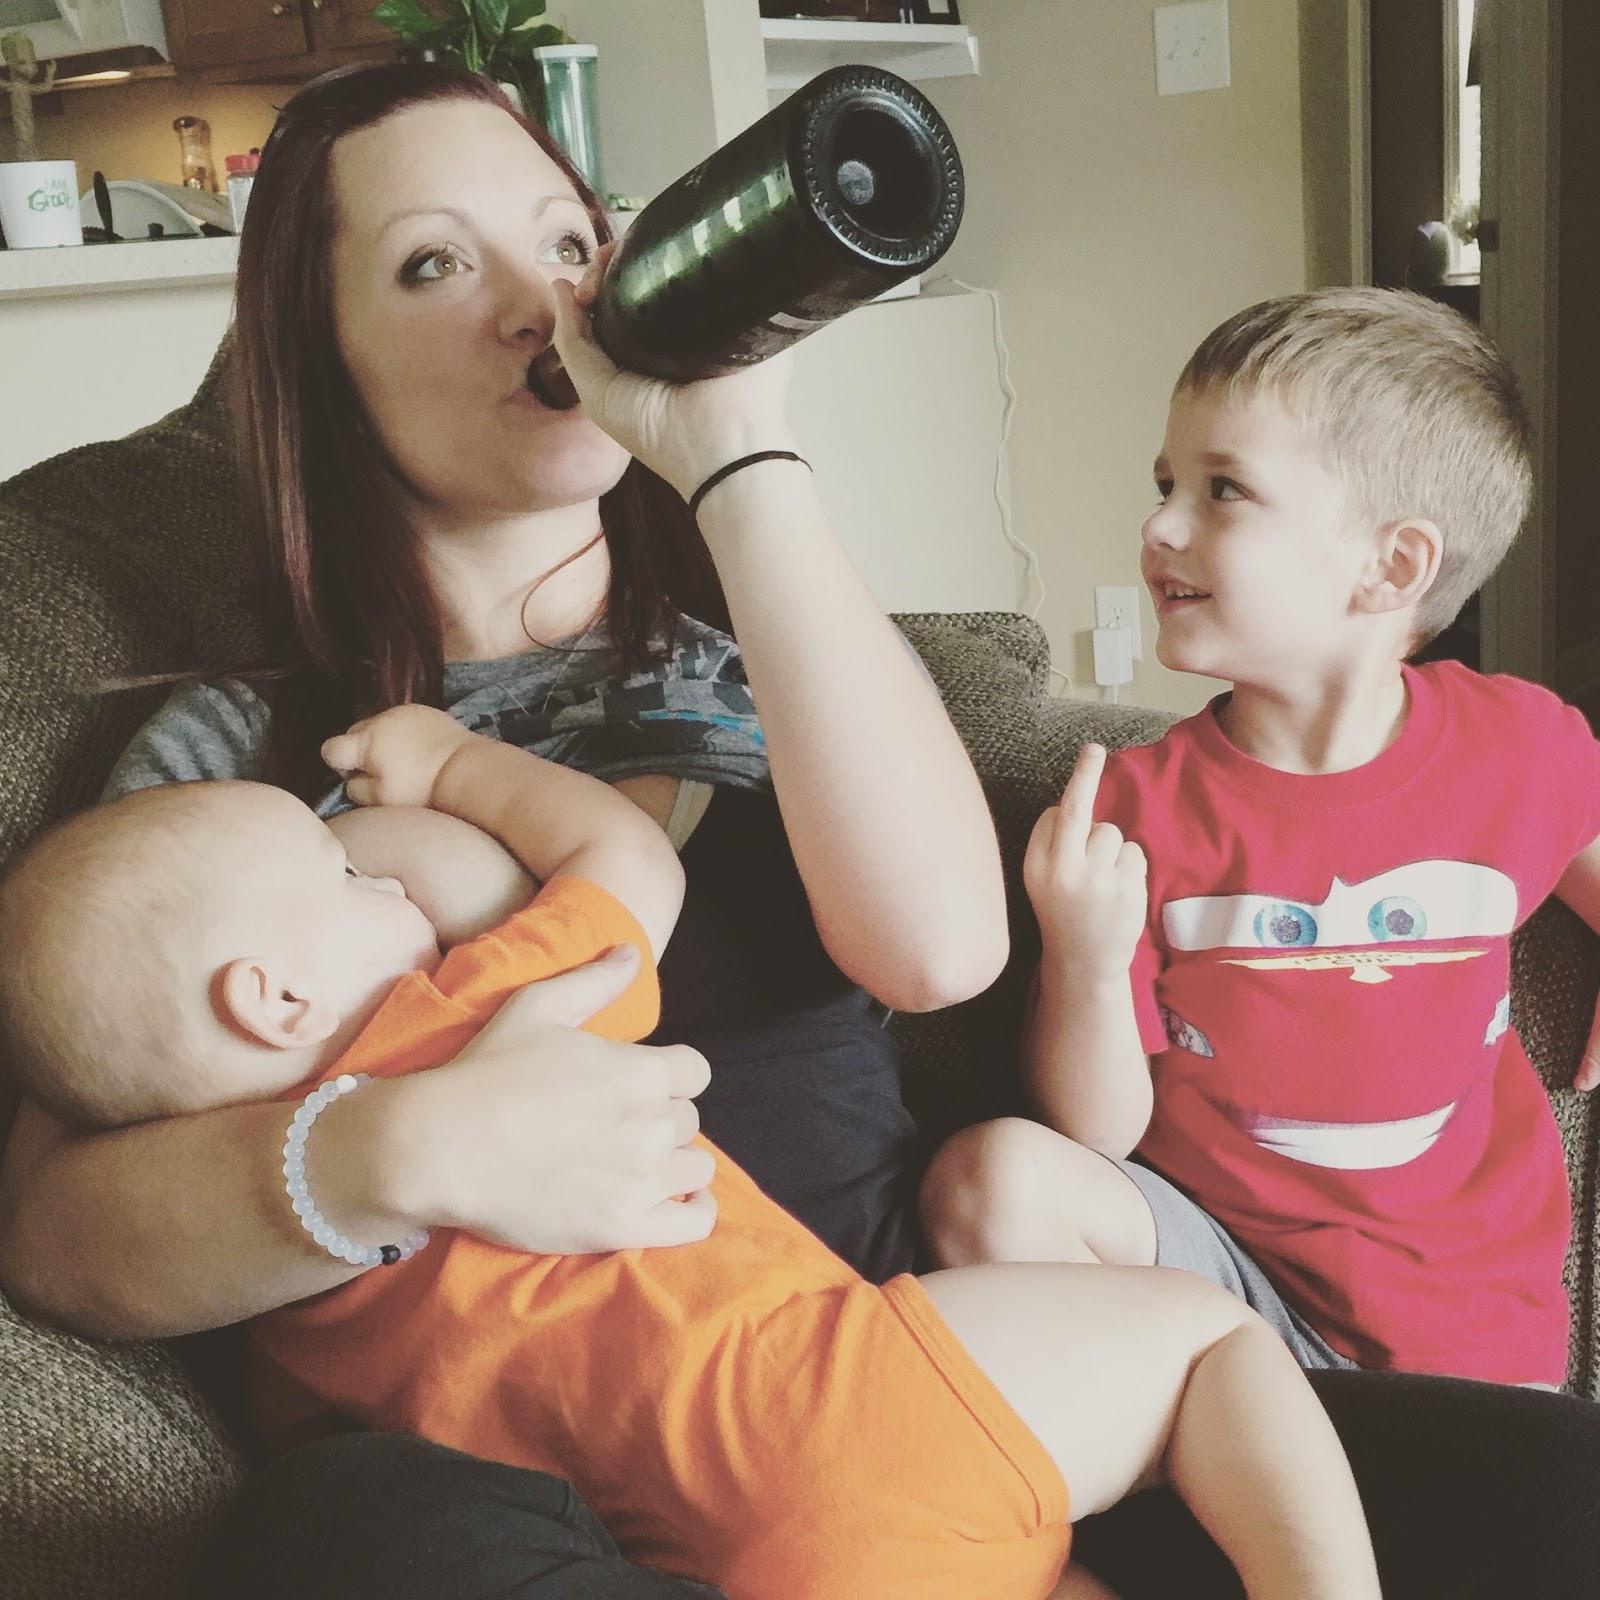 wine during breastfeeding